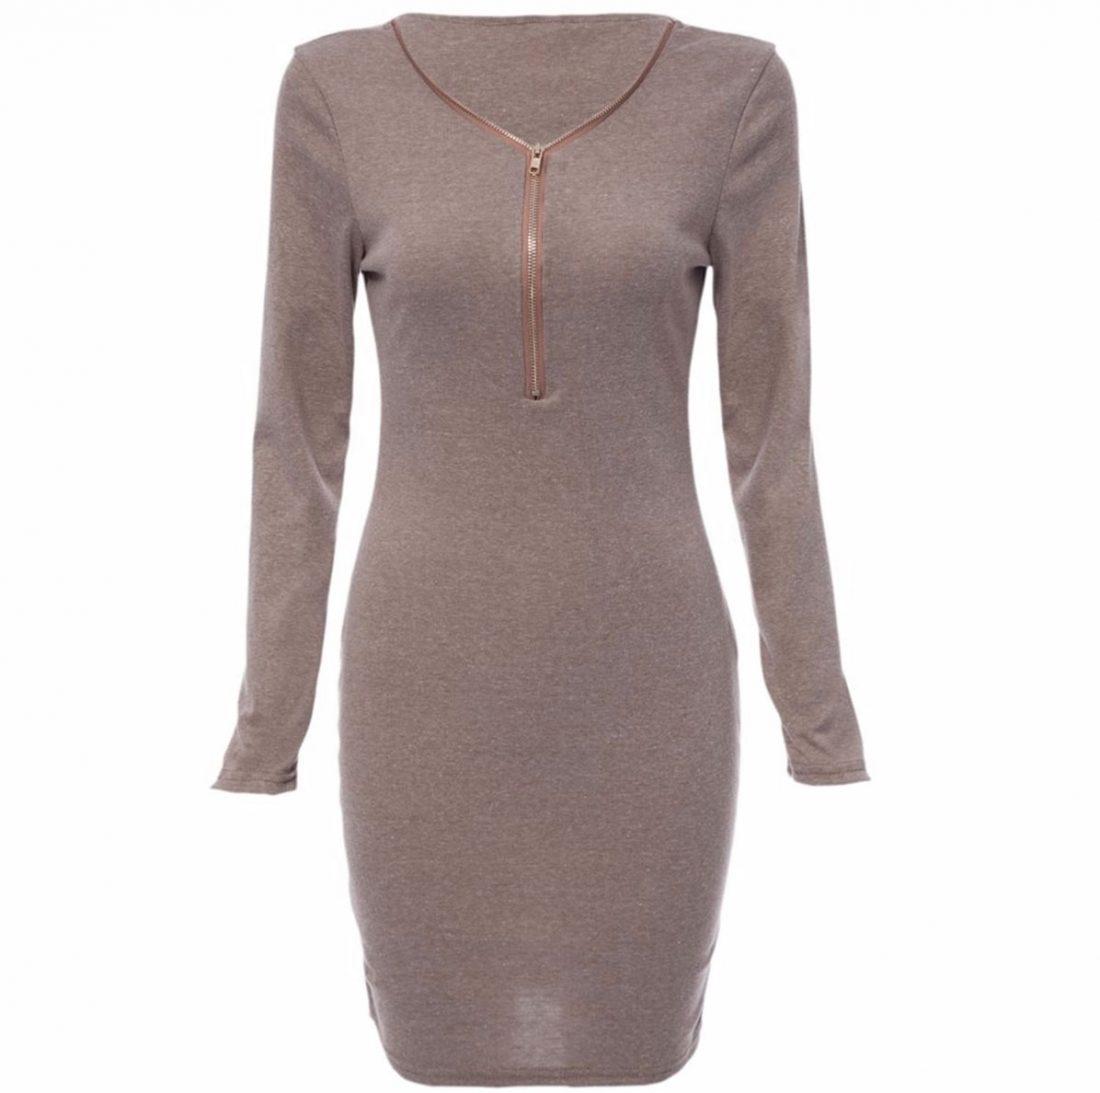 M0183 gray2 Long Sleeve Dresses maureens.com boutique